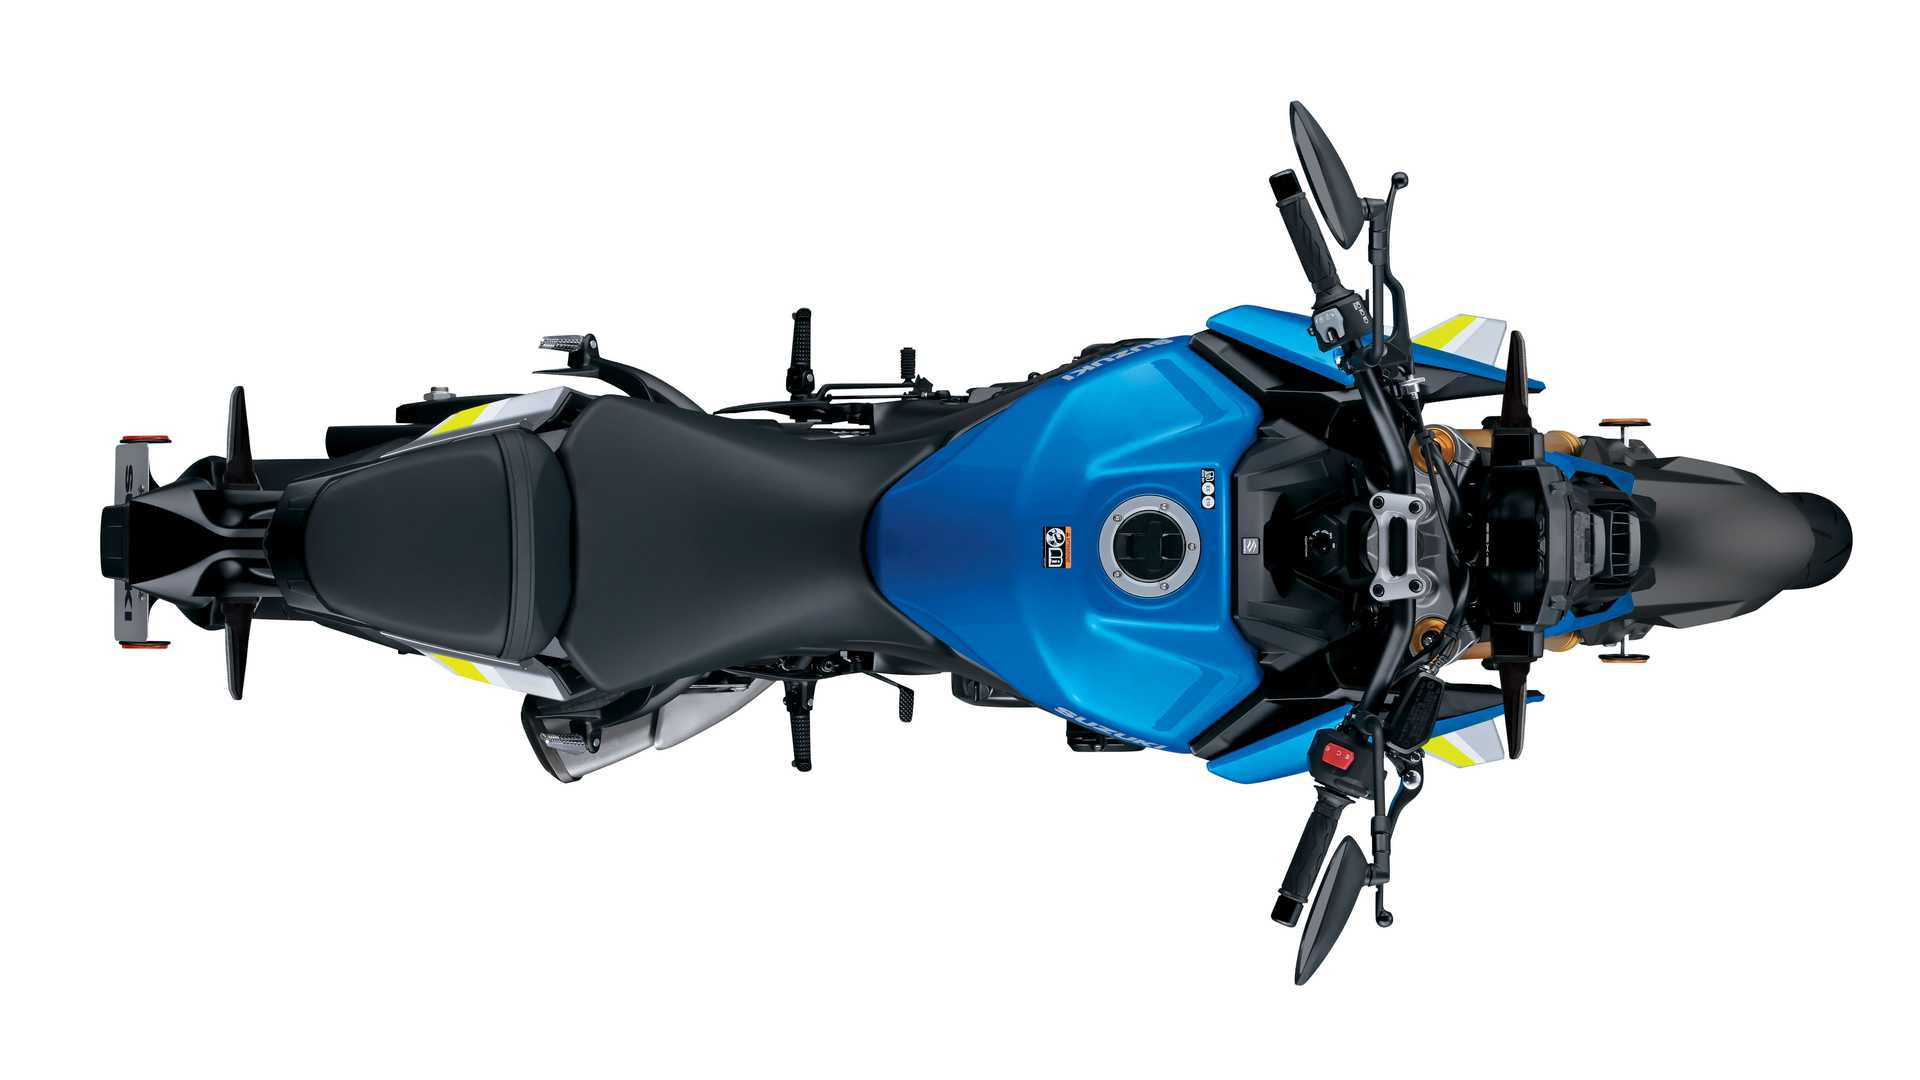 Global Reveal - The Suzuki 2022 GSX-S1000